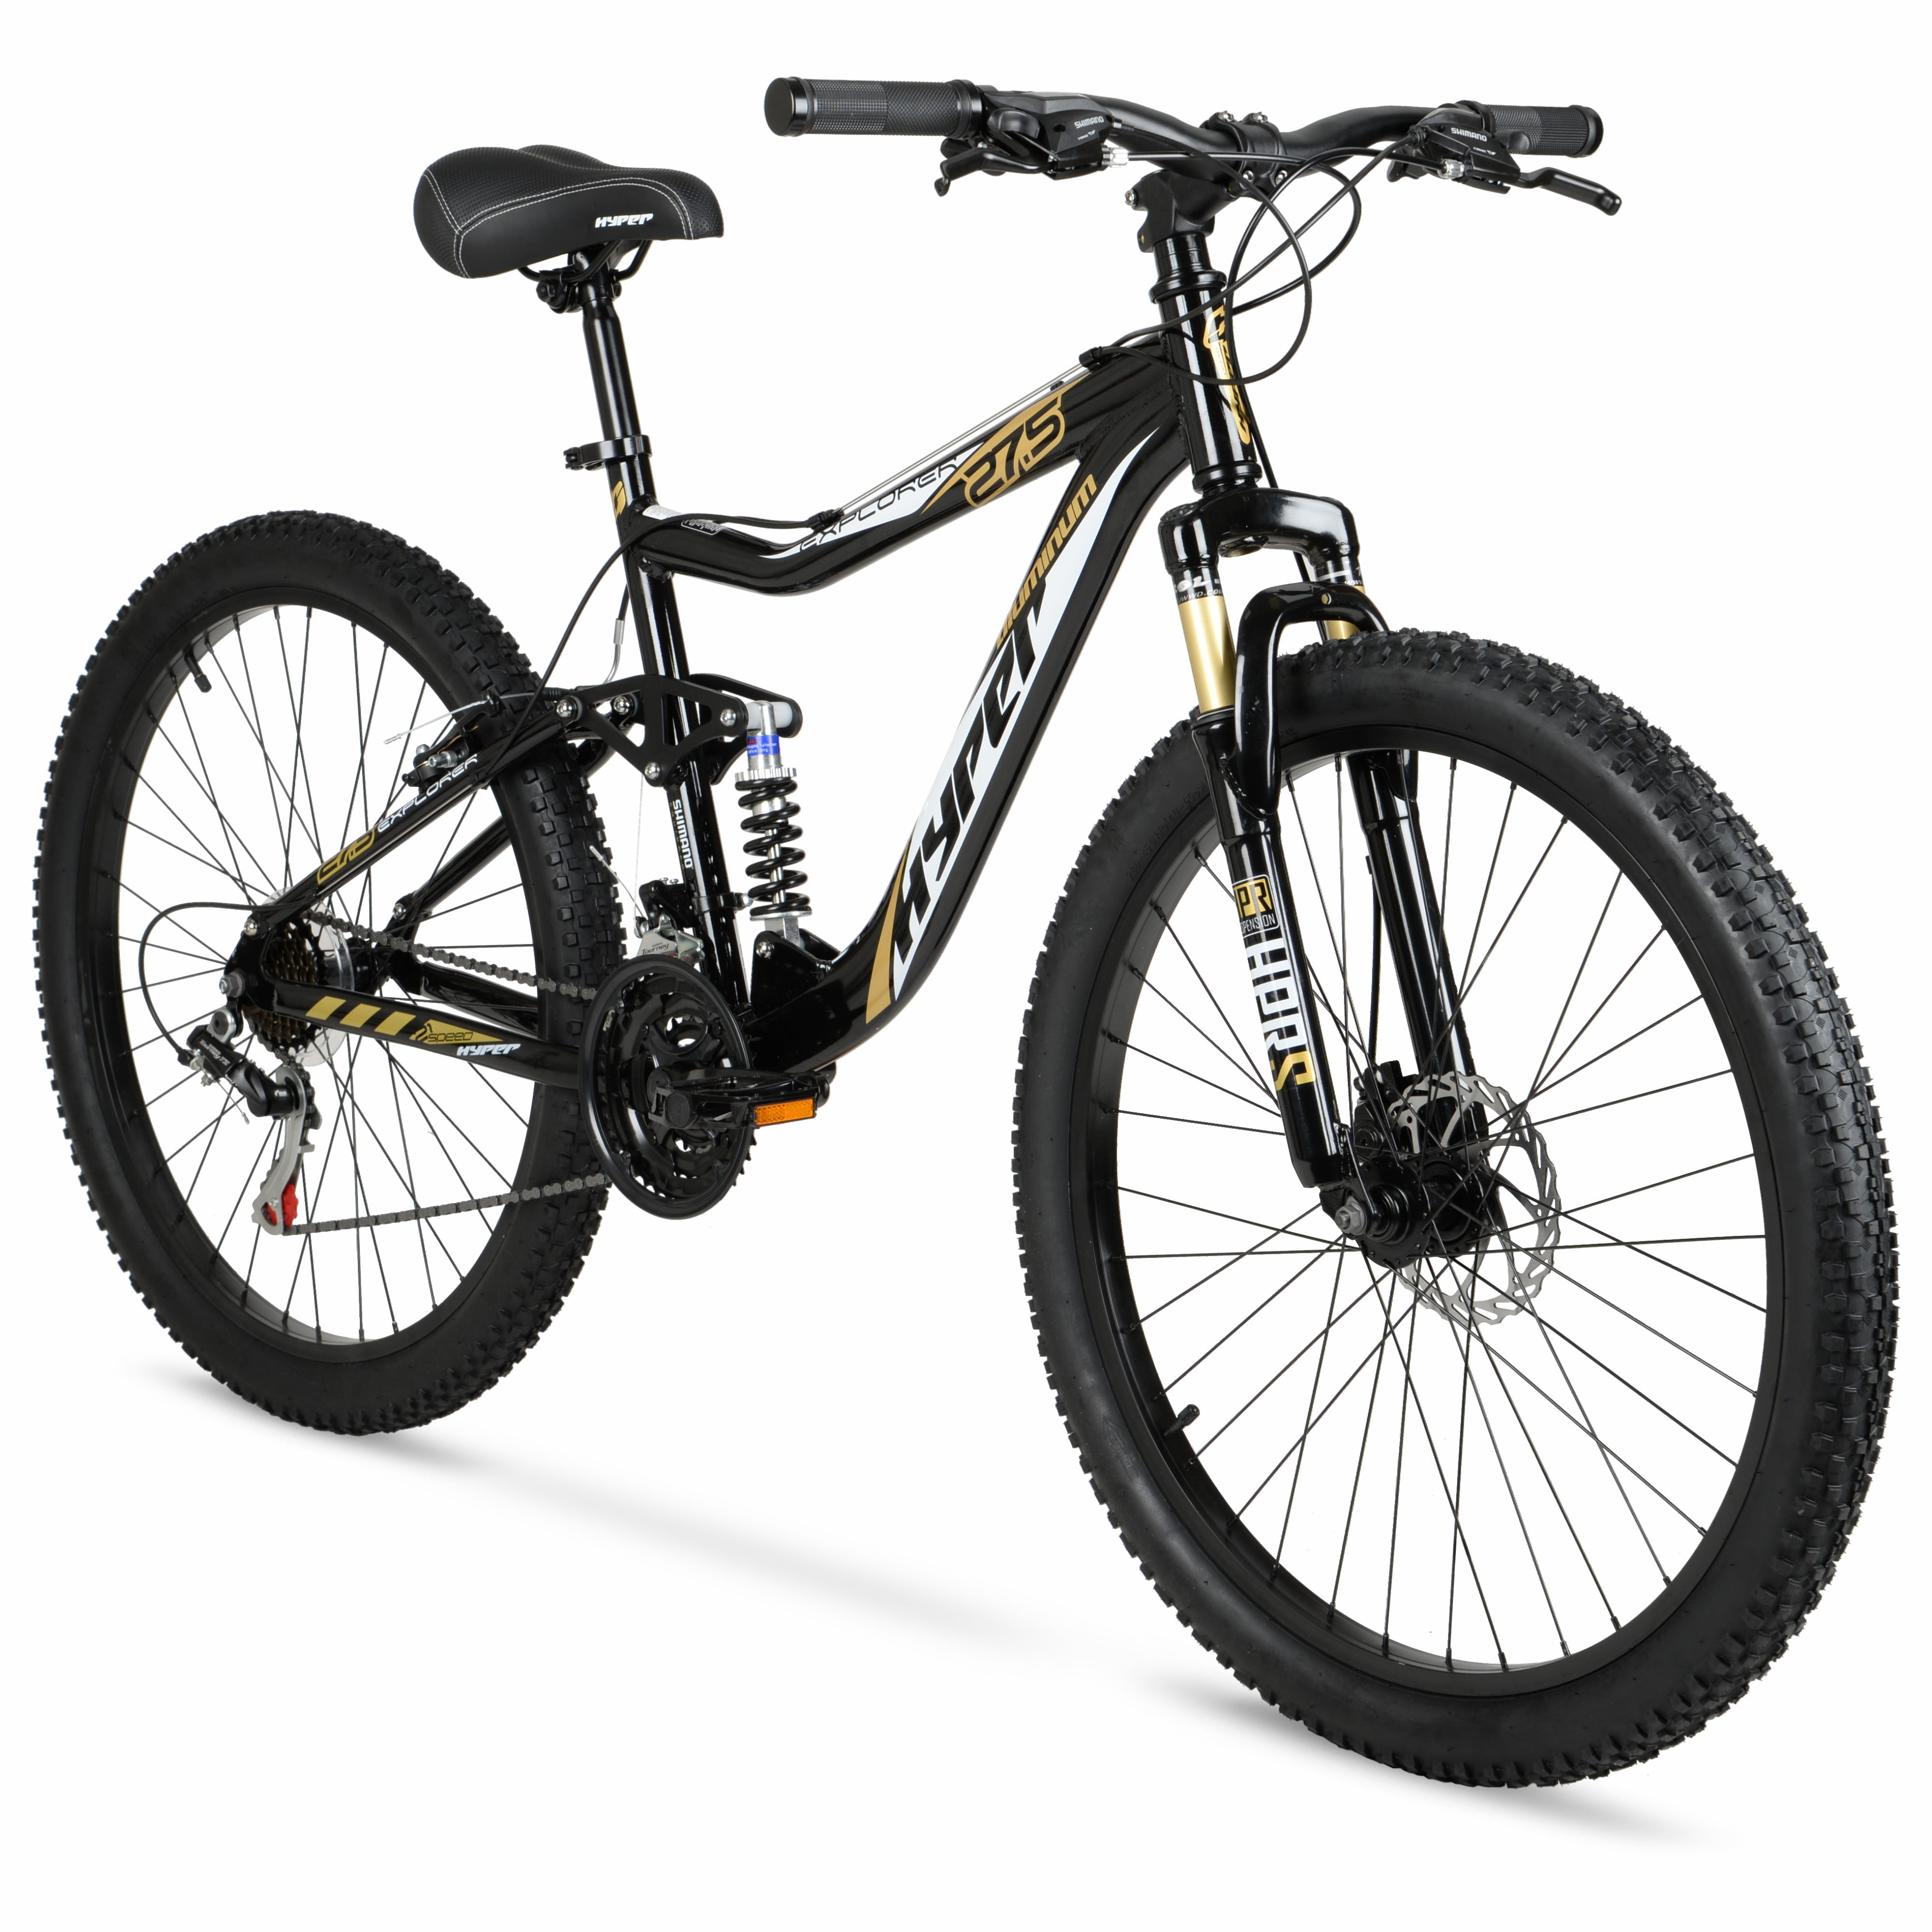 "Hyper Bicycles 27.5"" Men's Explorer Mountain Bike"